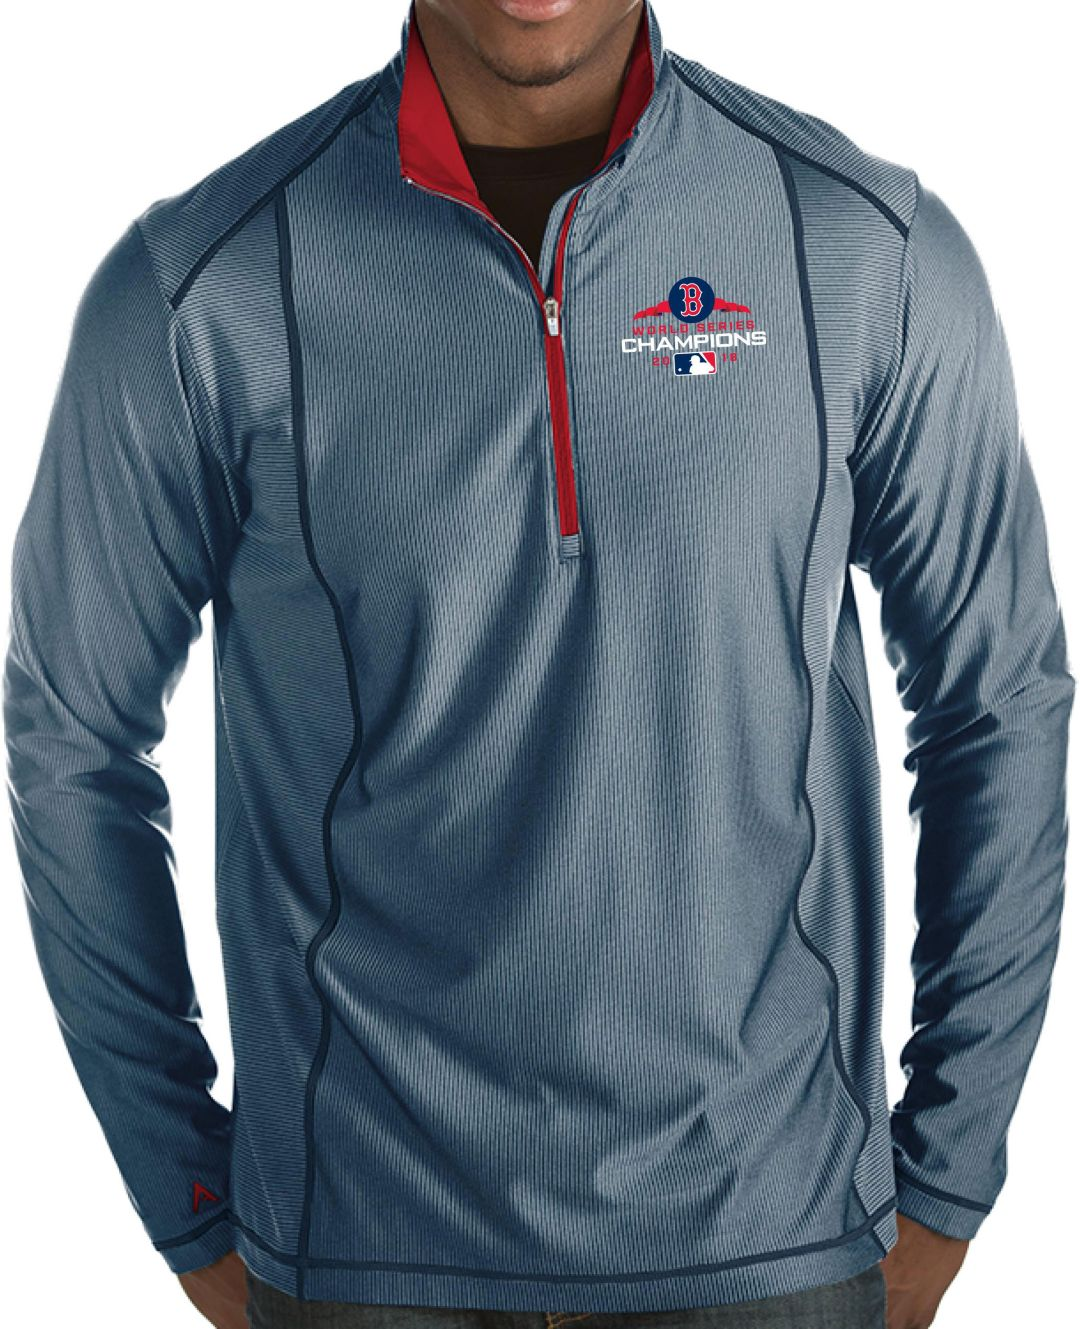 wholesale dealer 5b089 b0df2 Antigua Men's 2018 World Series Champions Boston Red Sox Navy Tempo  Quarter-Zip Pullover